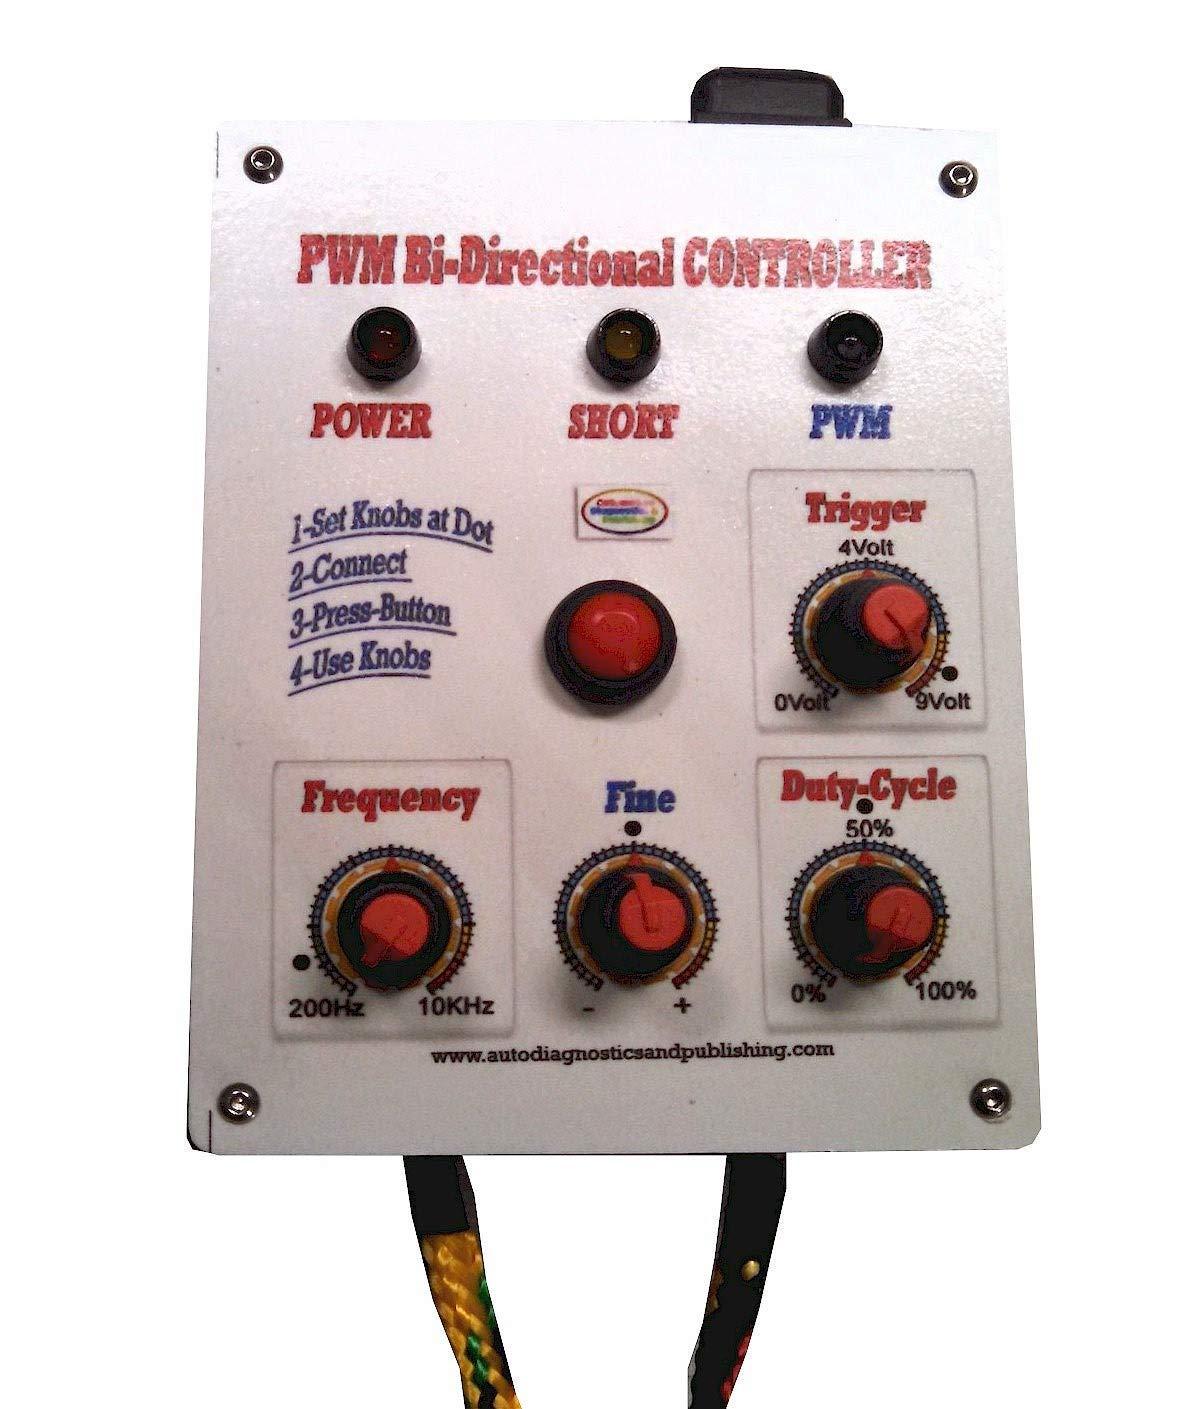 ADPTraining Automotive PWM Controller Pulse Width Modulation Tester Driver by ADPTraining